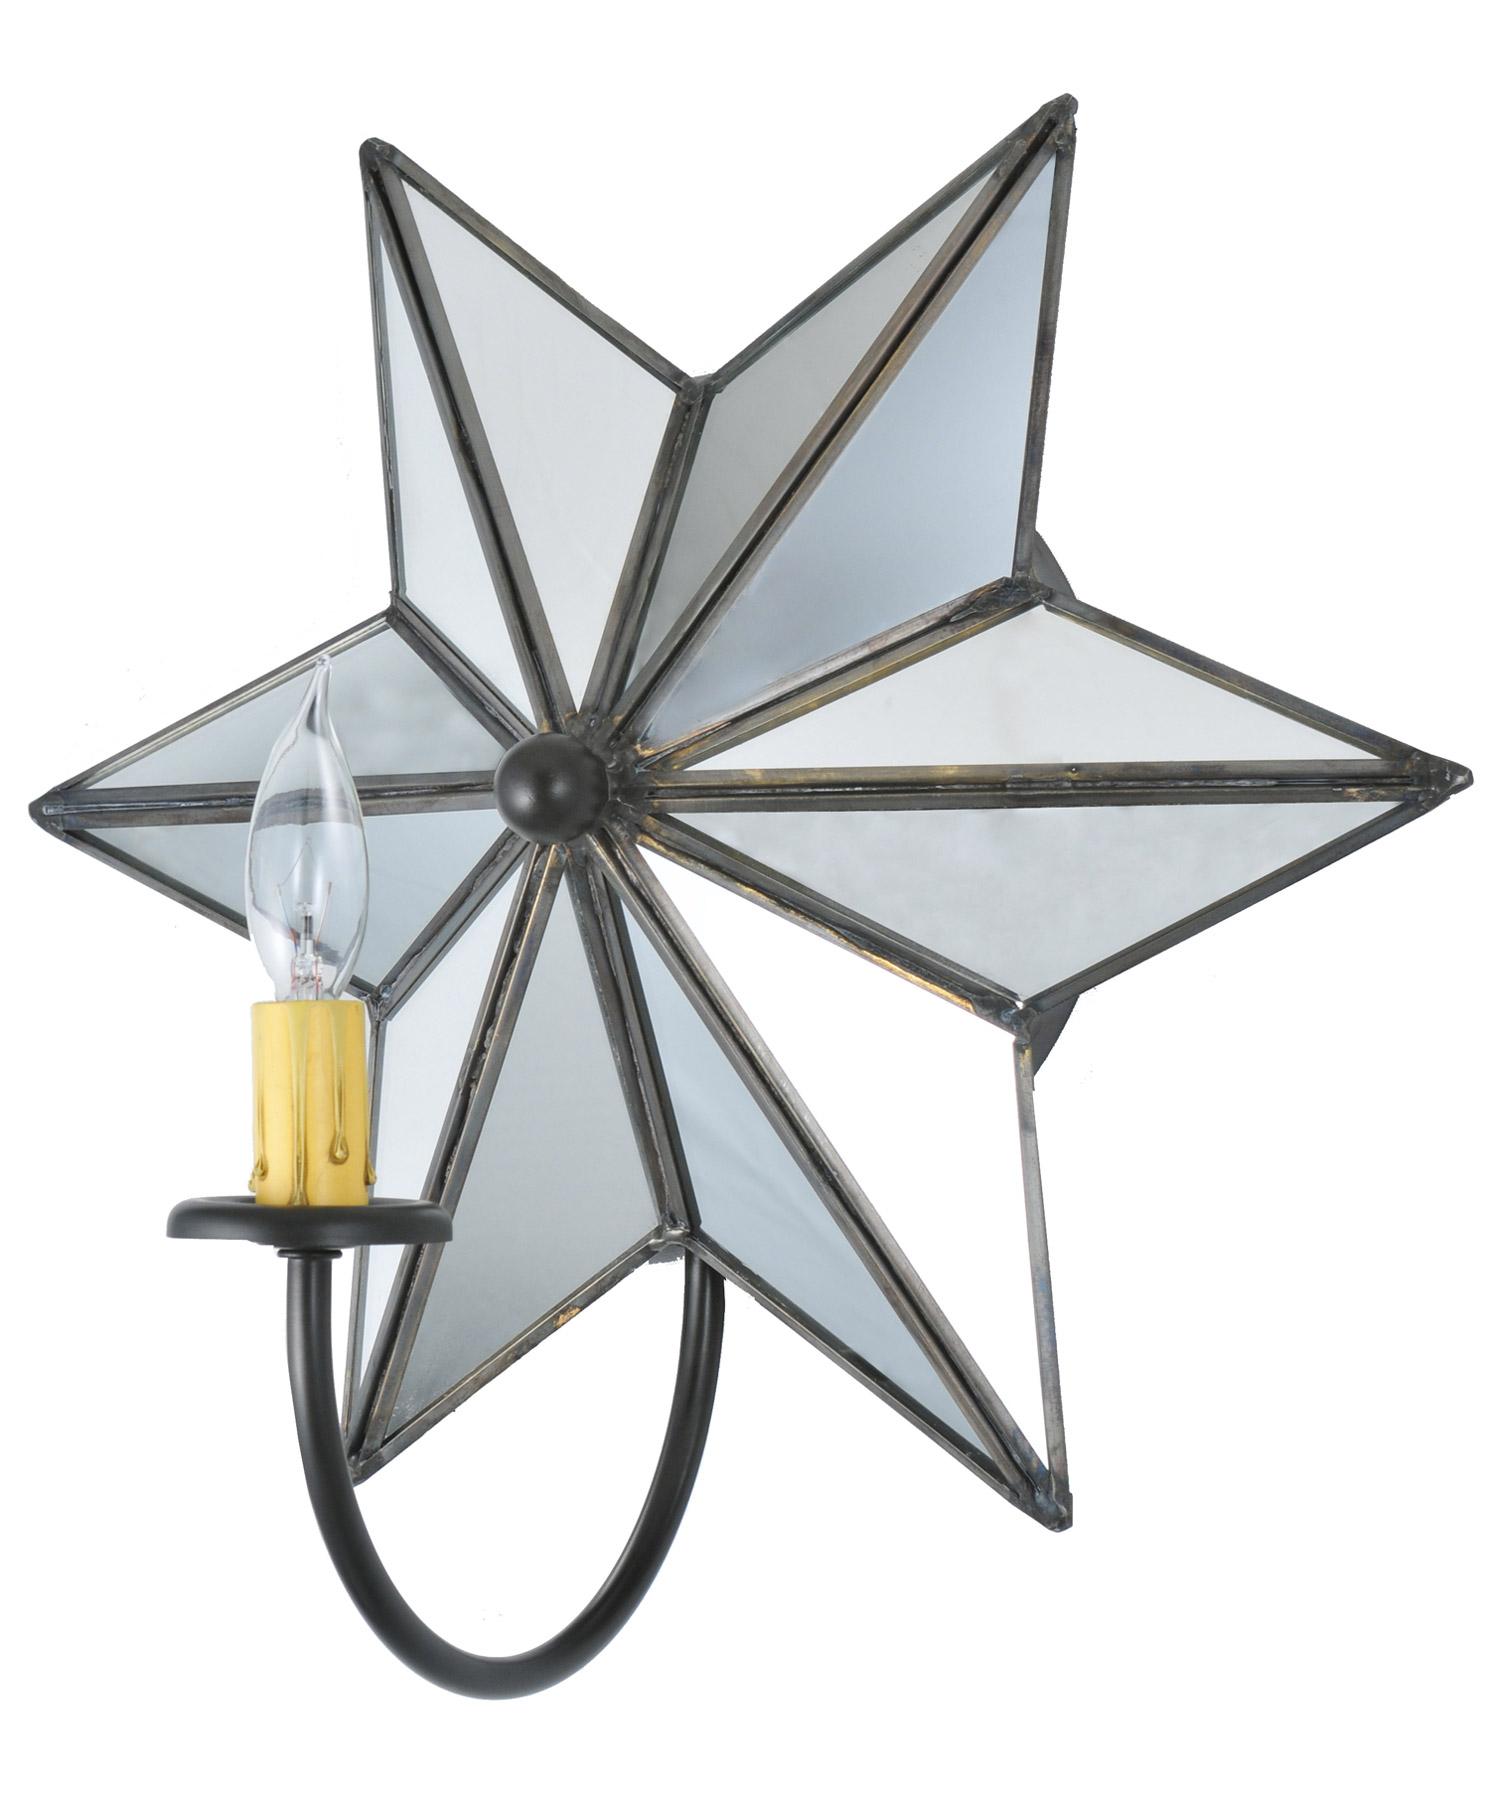 Star Wall Light Bhs : Meyda 73448 Mirrored Star Wall Sconce